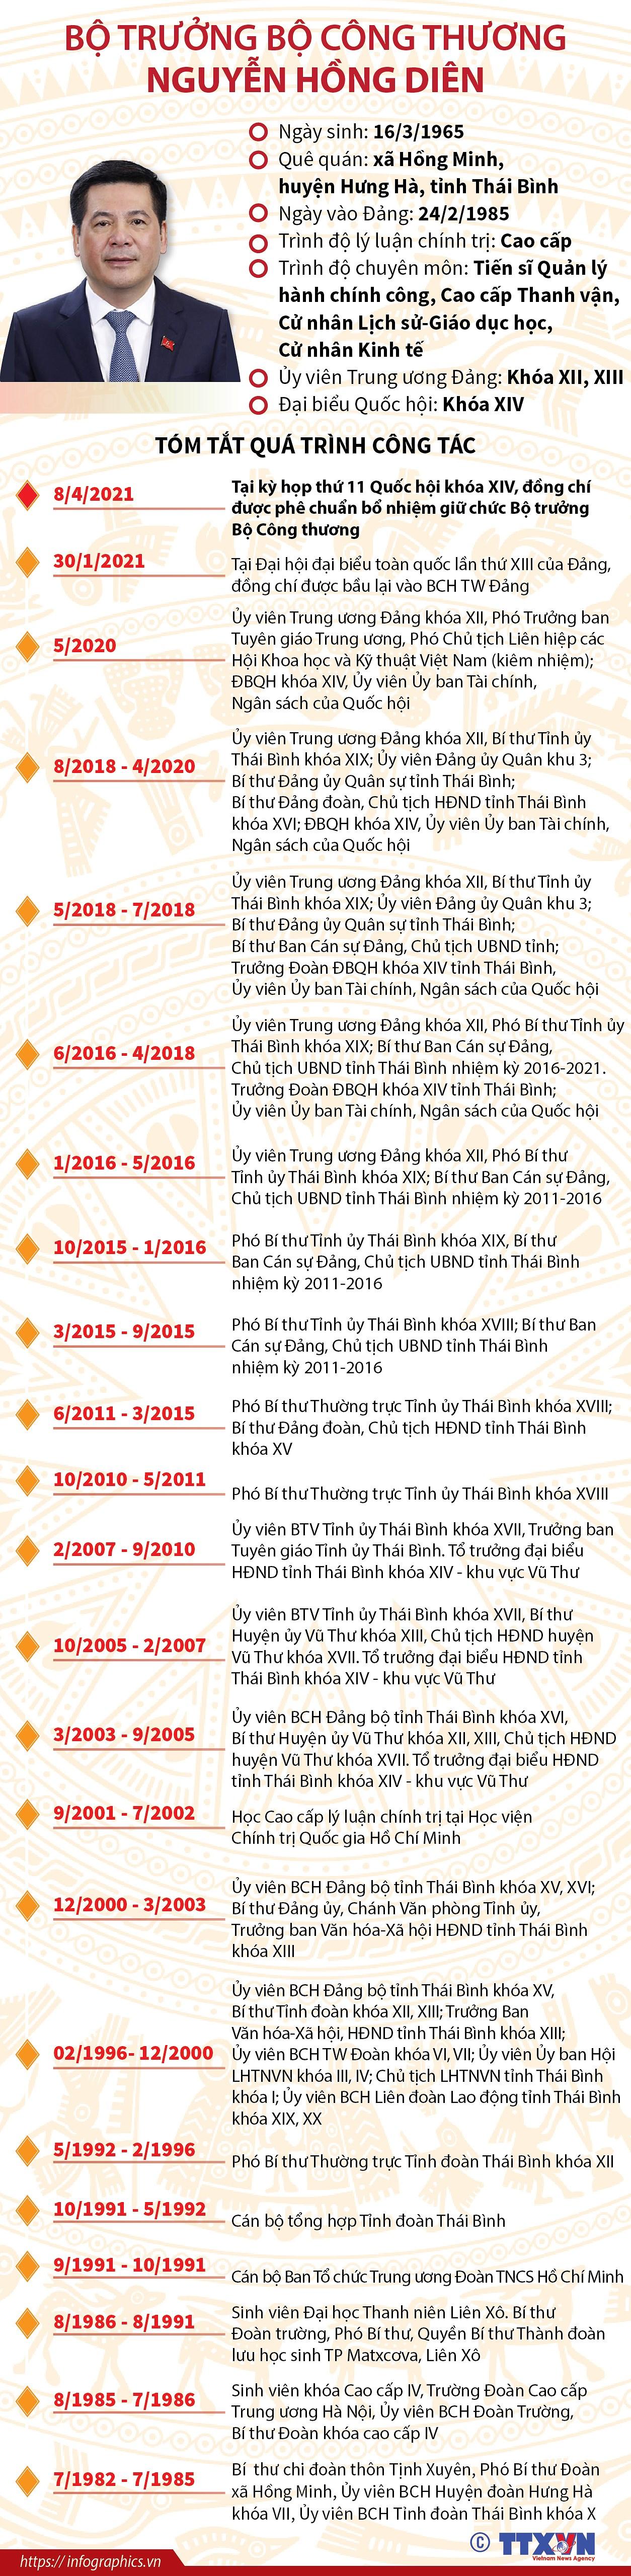 [Infographics] Tieu su Bo truong Bo Cong Thuong Nguyen Hong Dien hinh anh 1